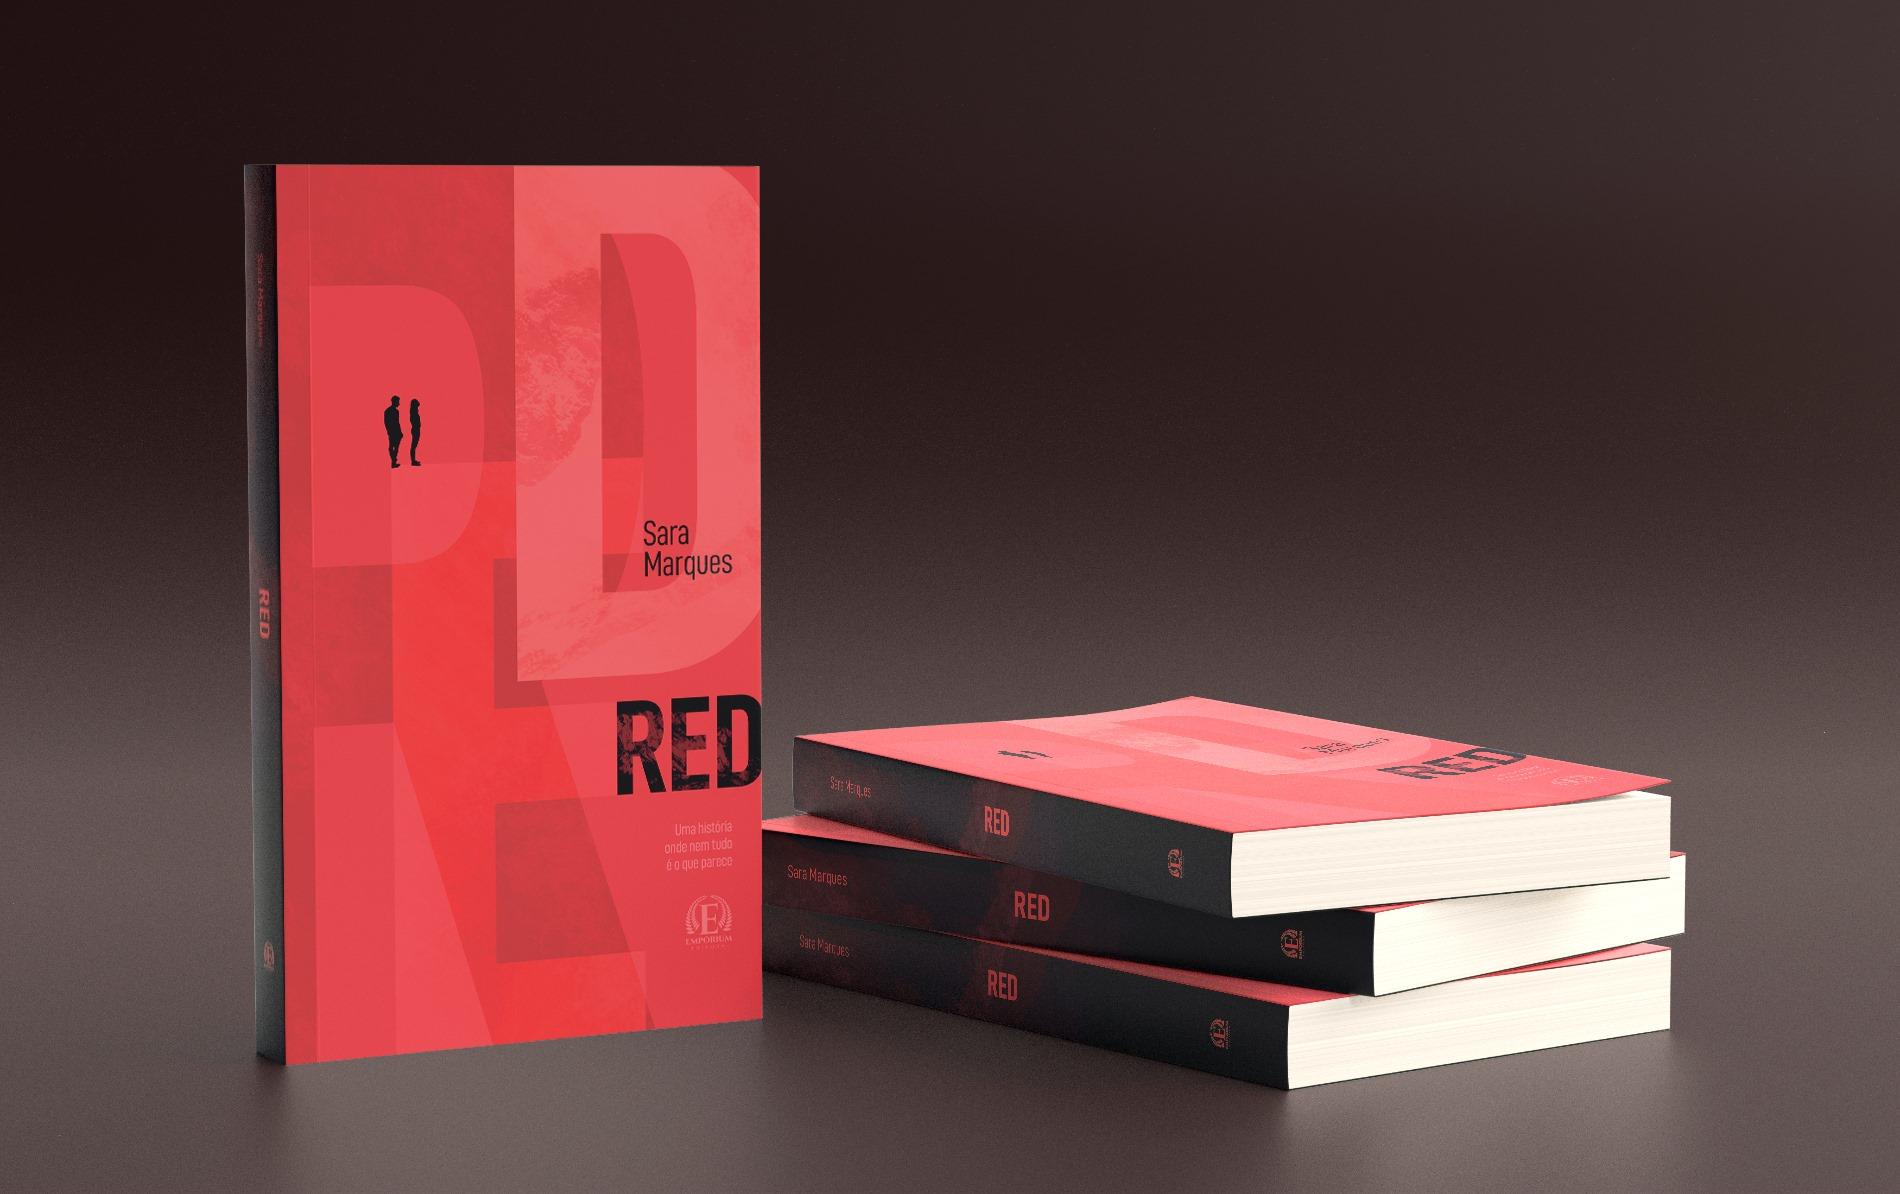 RED, romance da autora Sara Marques